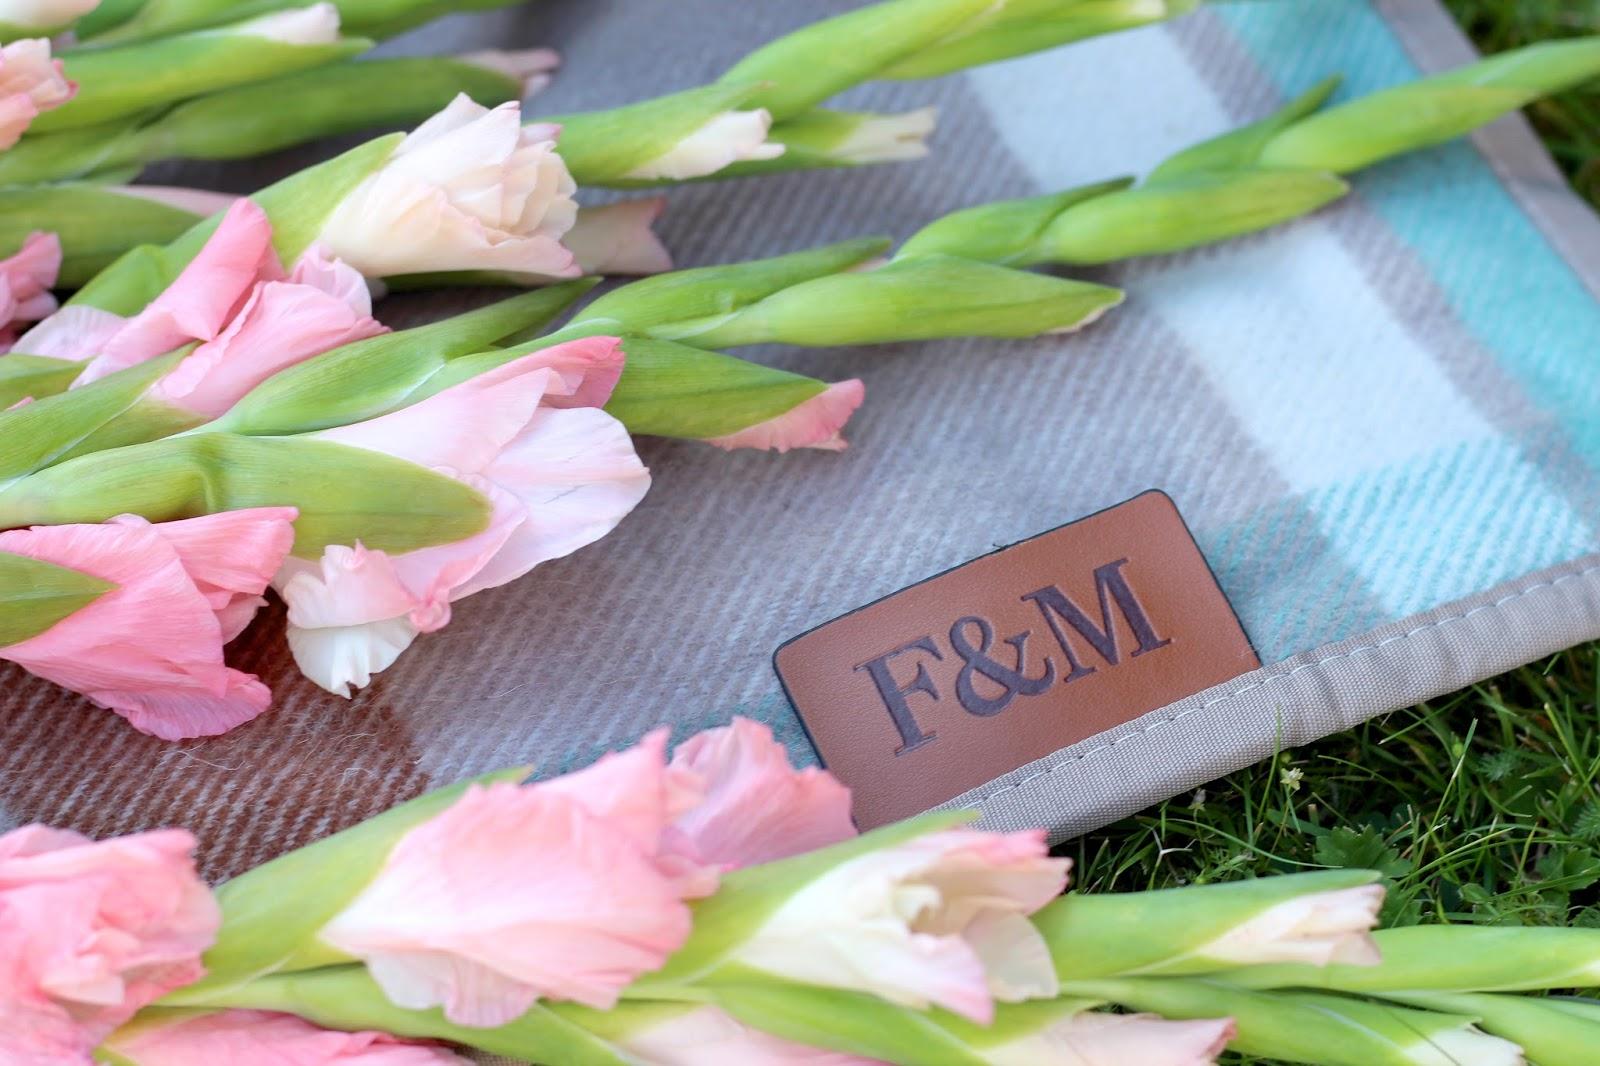 Fortnum and Mason's picnic rug